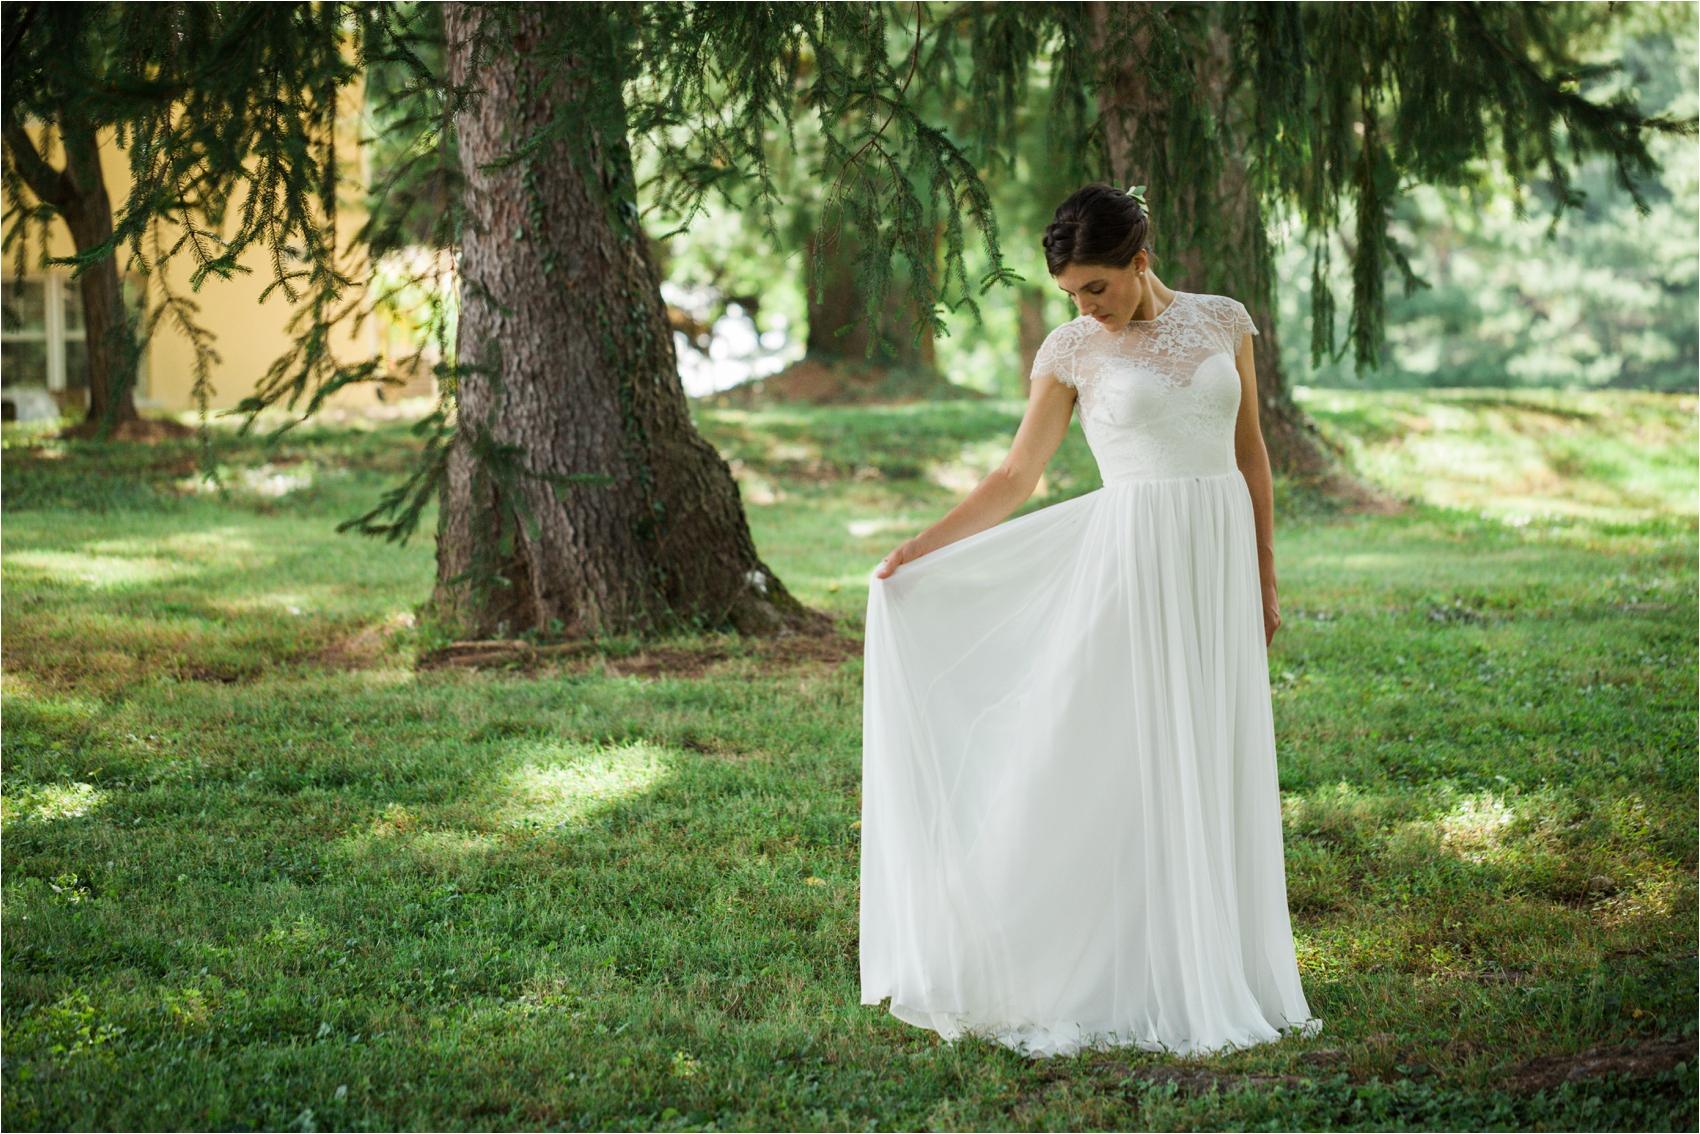 Feather-and-Oak-Rainforest-Trust-Virginia-Wedding-3667.jpg